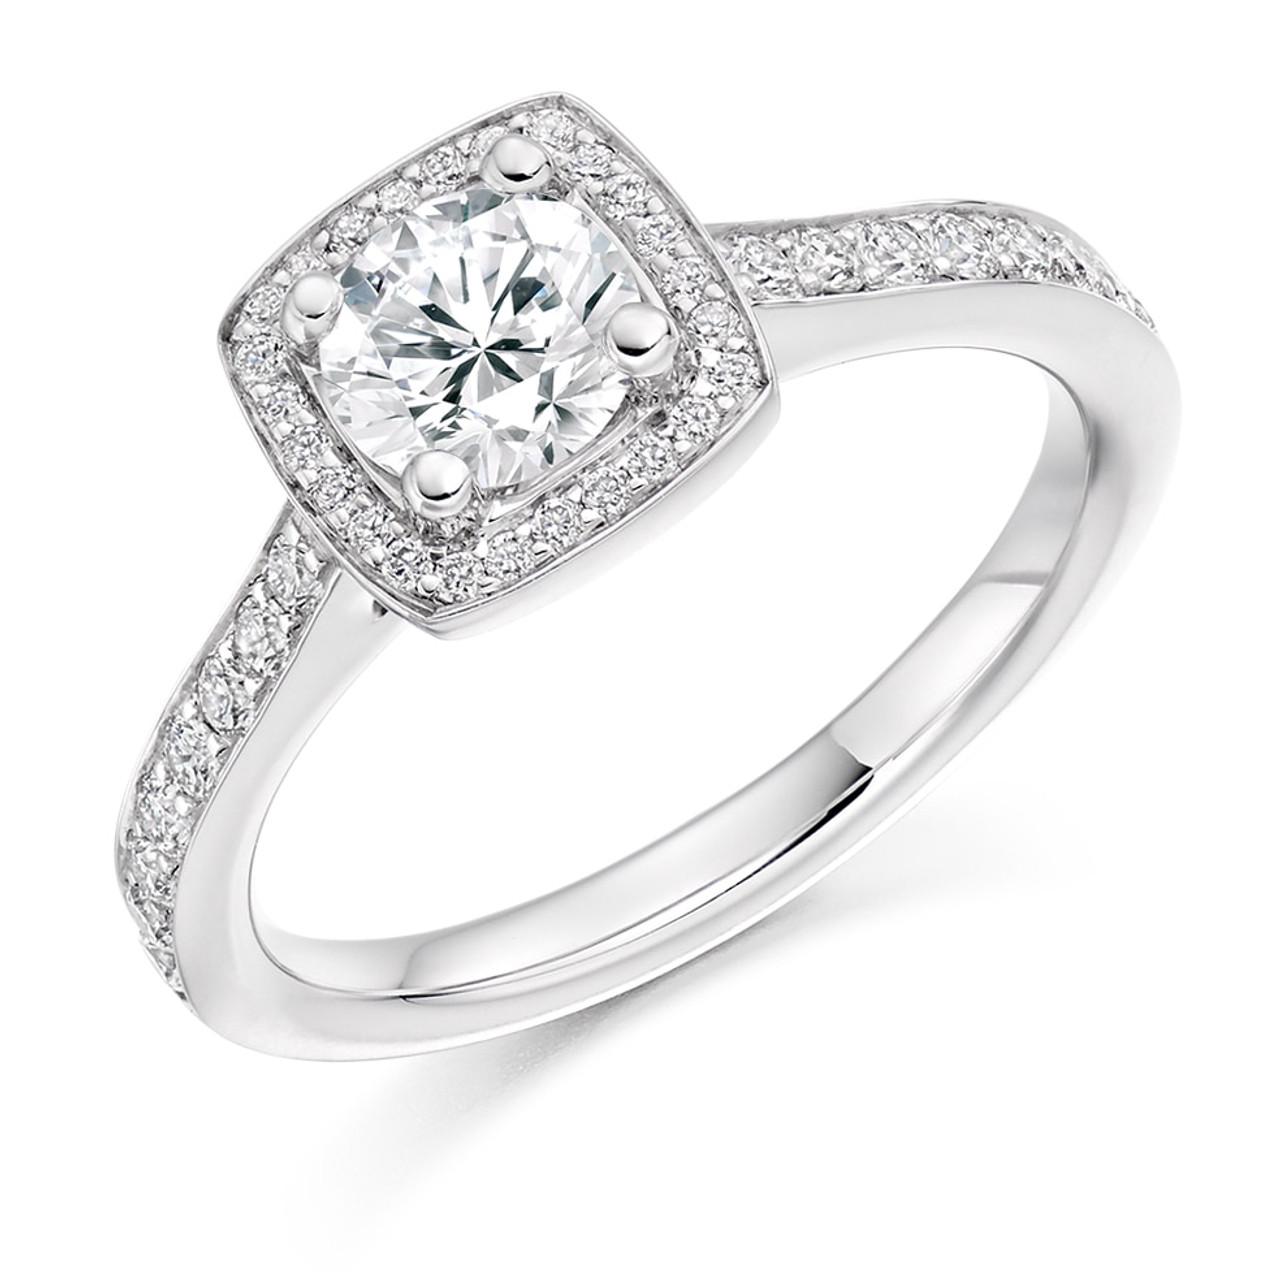 Harebell 0.30ct Diamond Engagement Ring